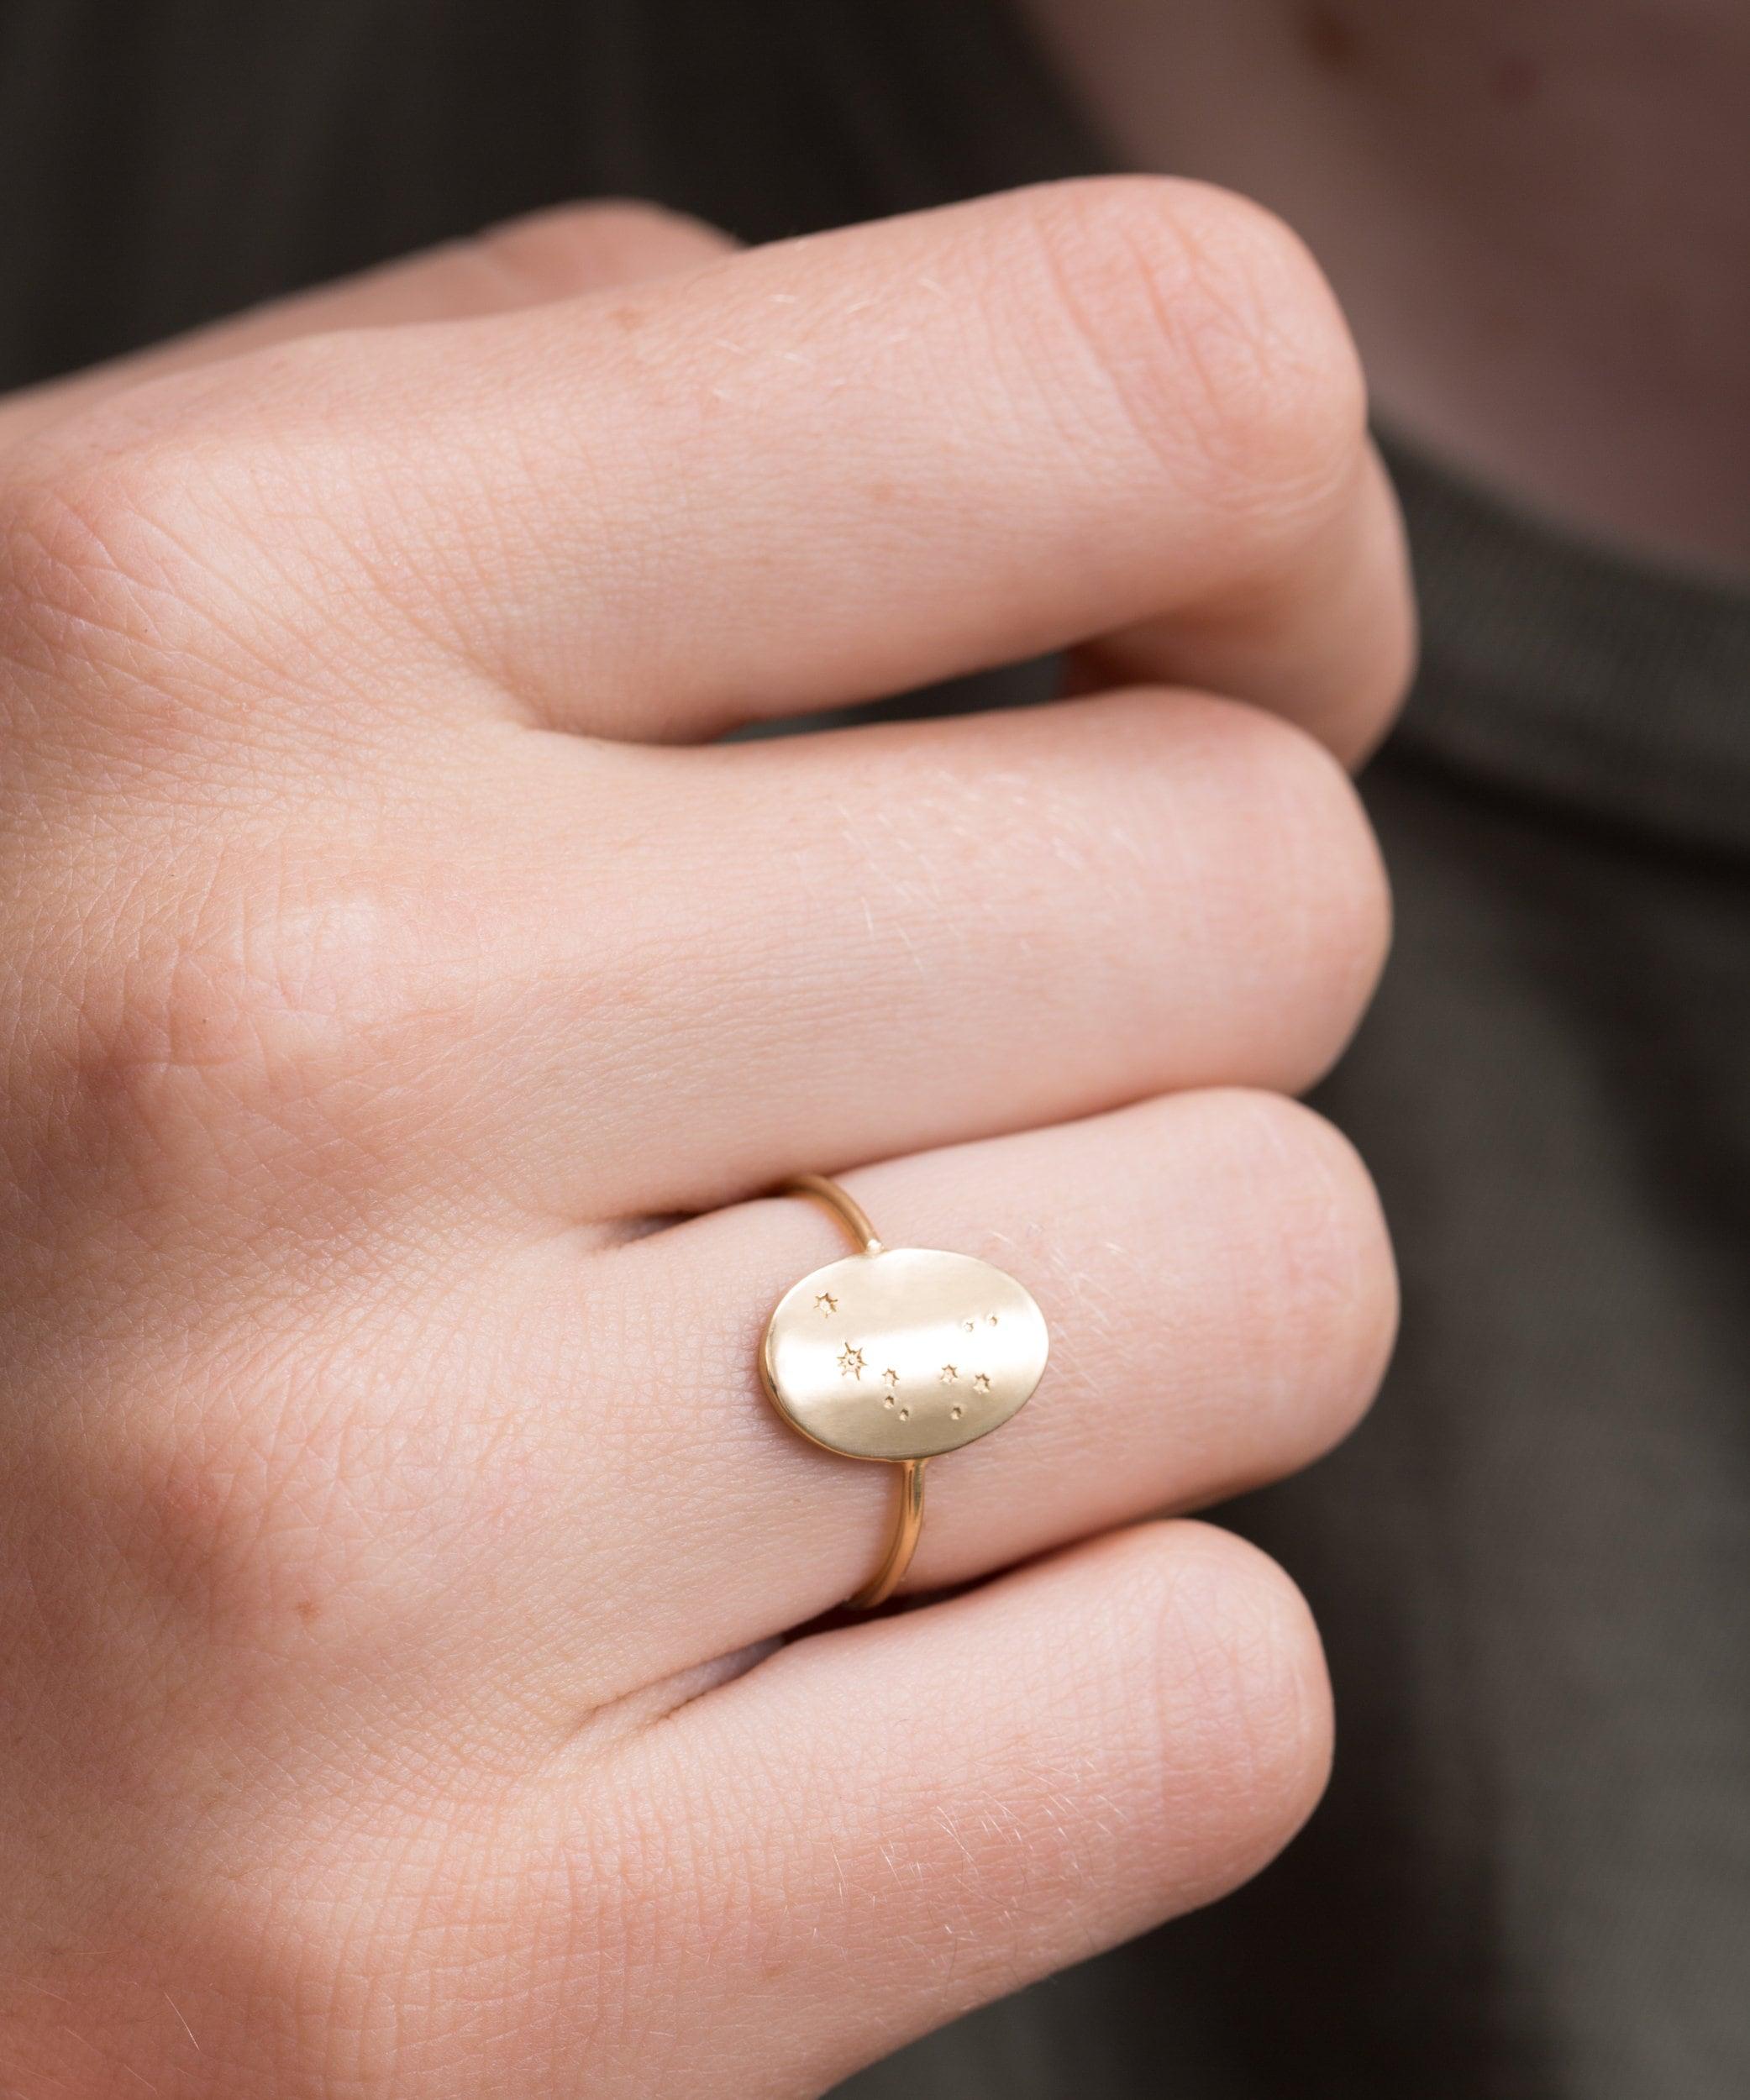 Zodiac Constellation Ring Oval or Disk Ring Custom Hand | Etsy